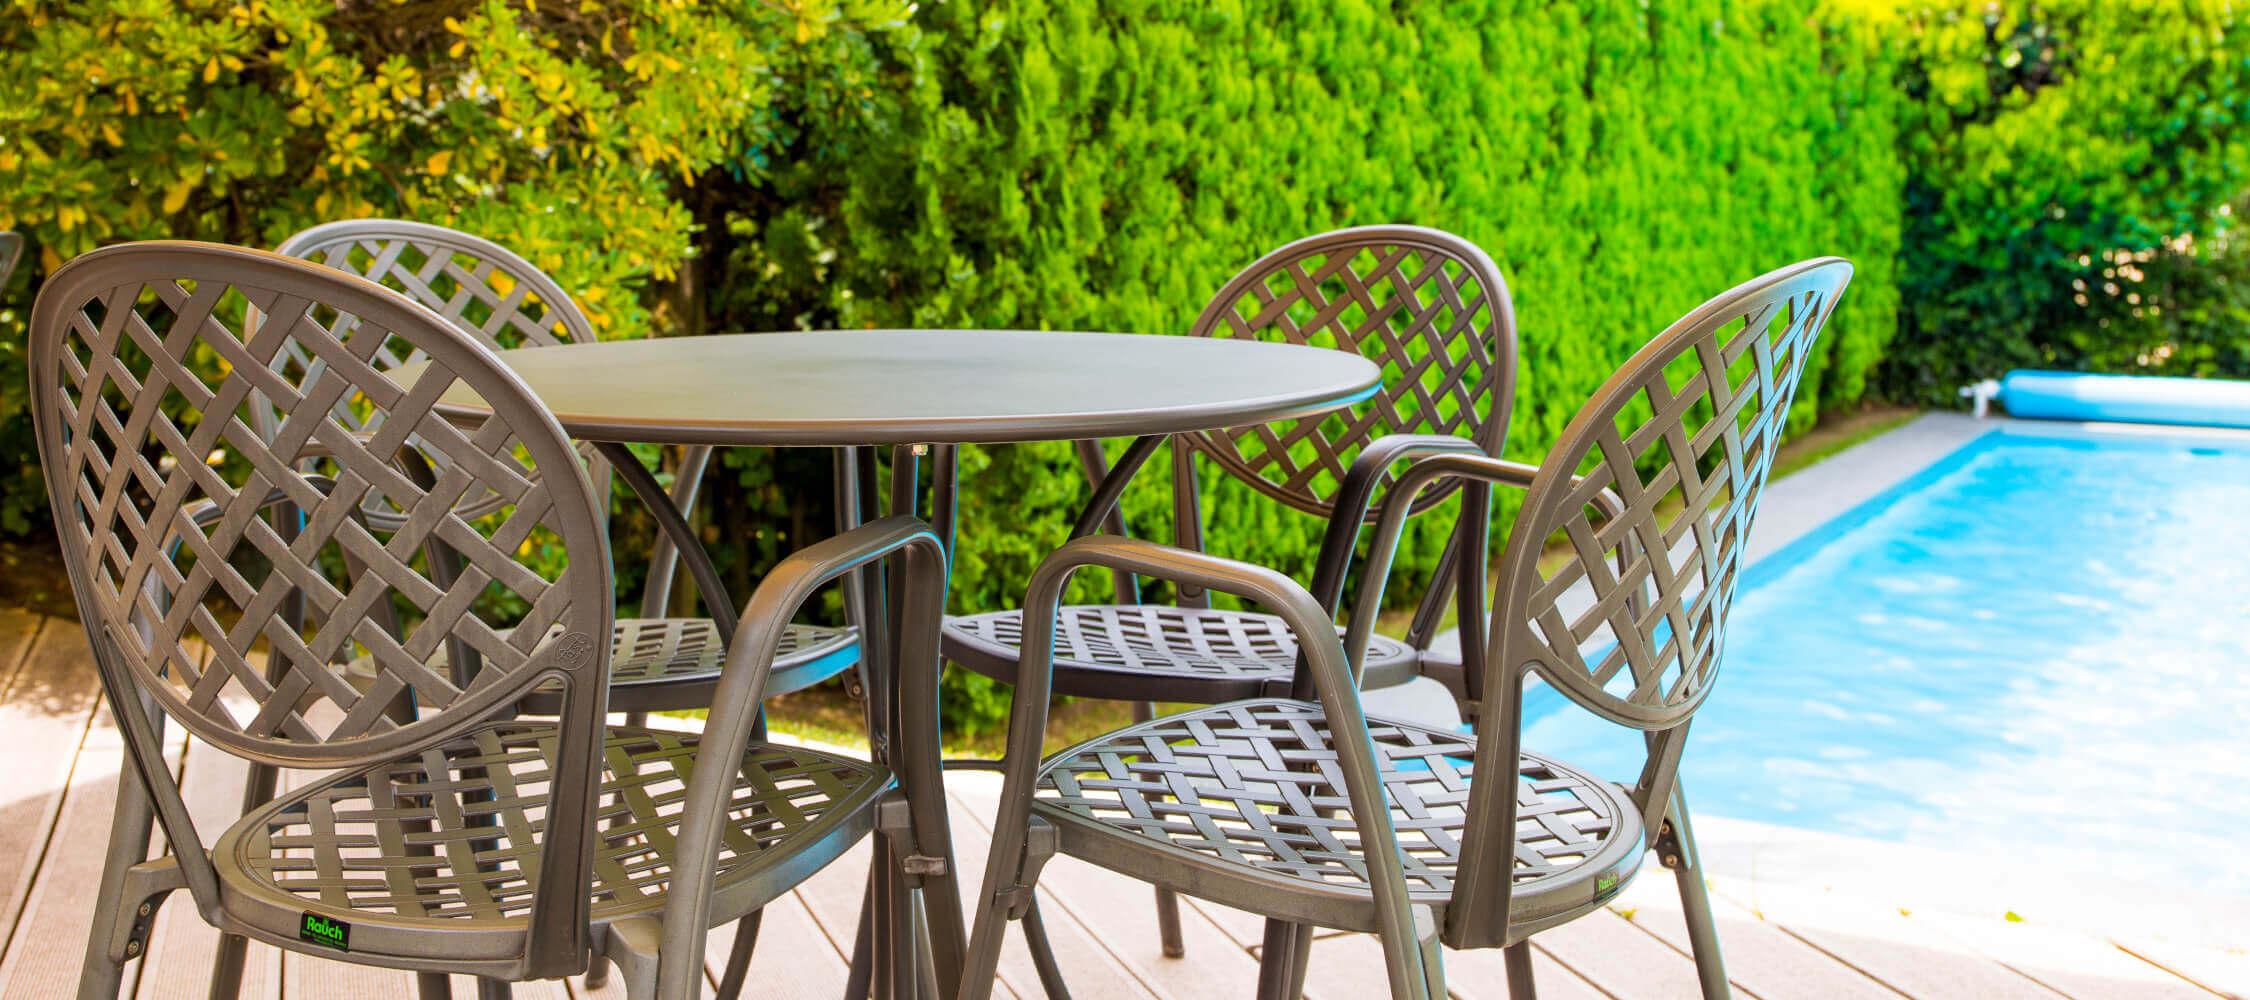 Hotel-Villa-Laurus-Merano-Garten-Terrasse-Pool-Detail-Anguane-6805-2250x1000